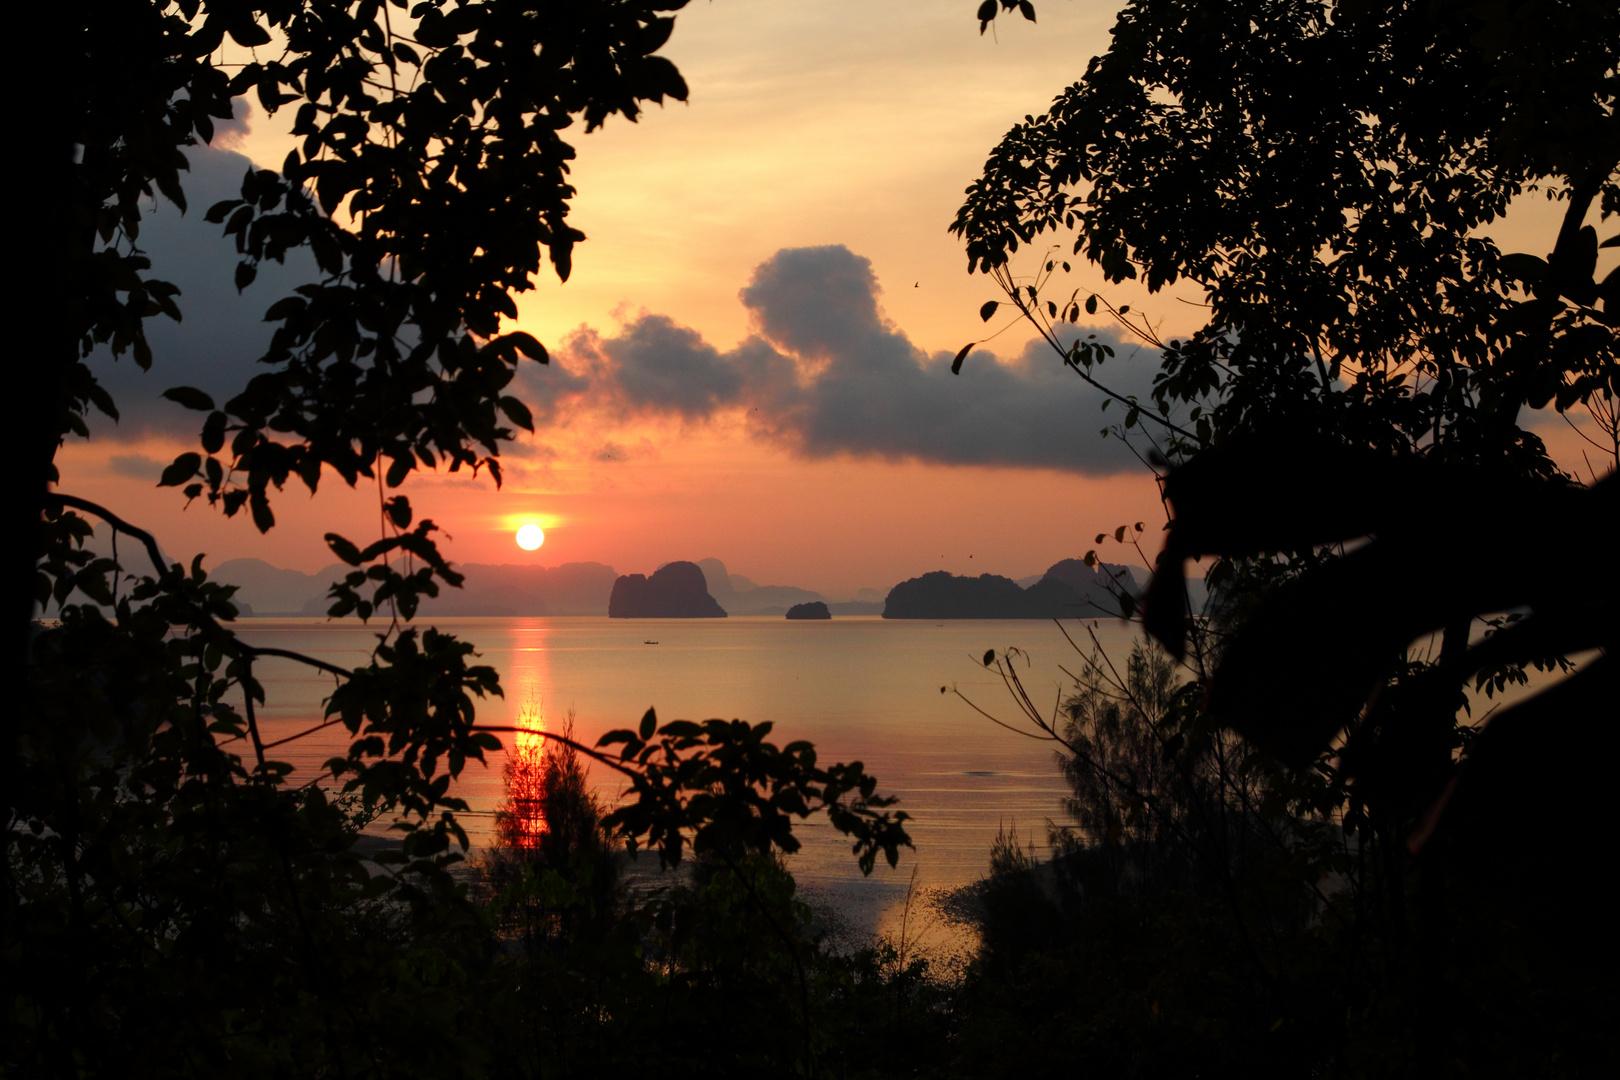 Sonnenaufgang auf Koh Yao Noi, Thailand